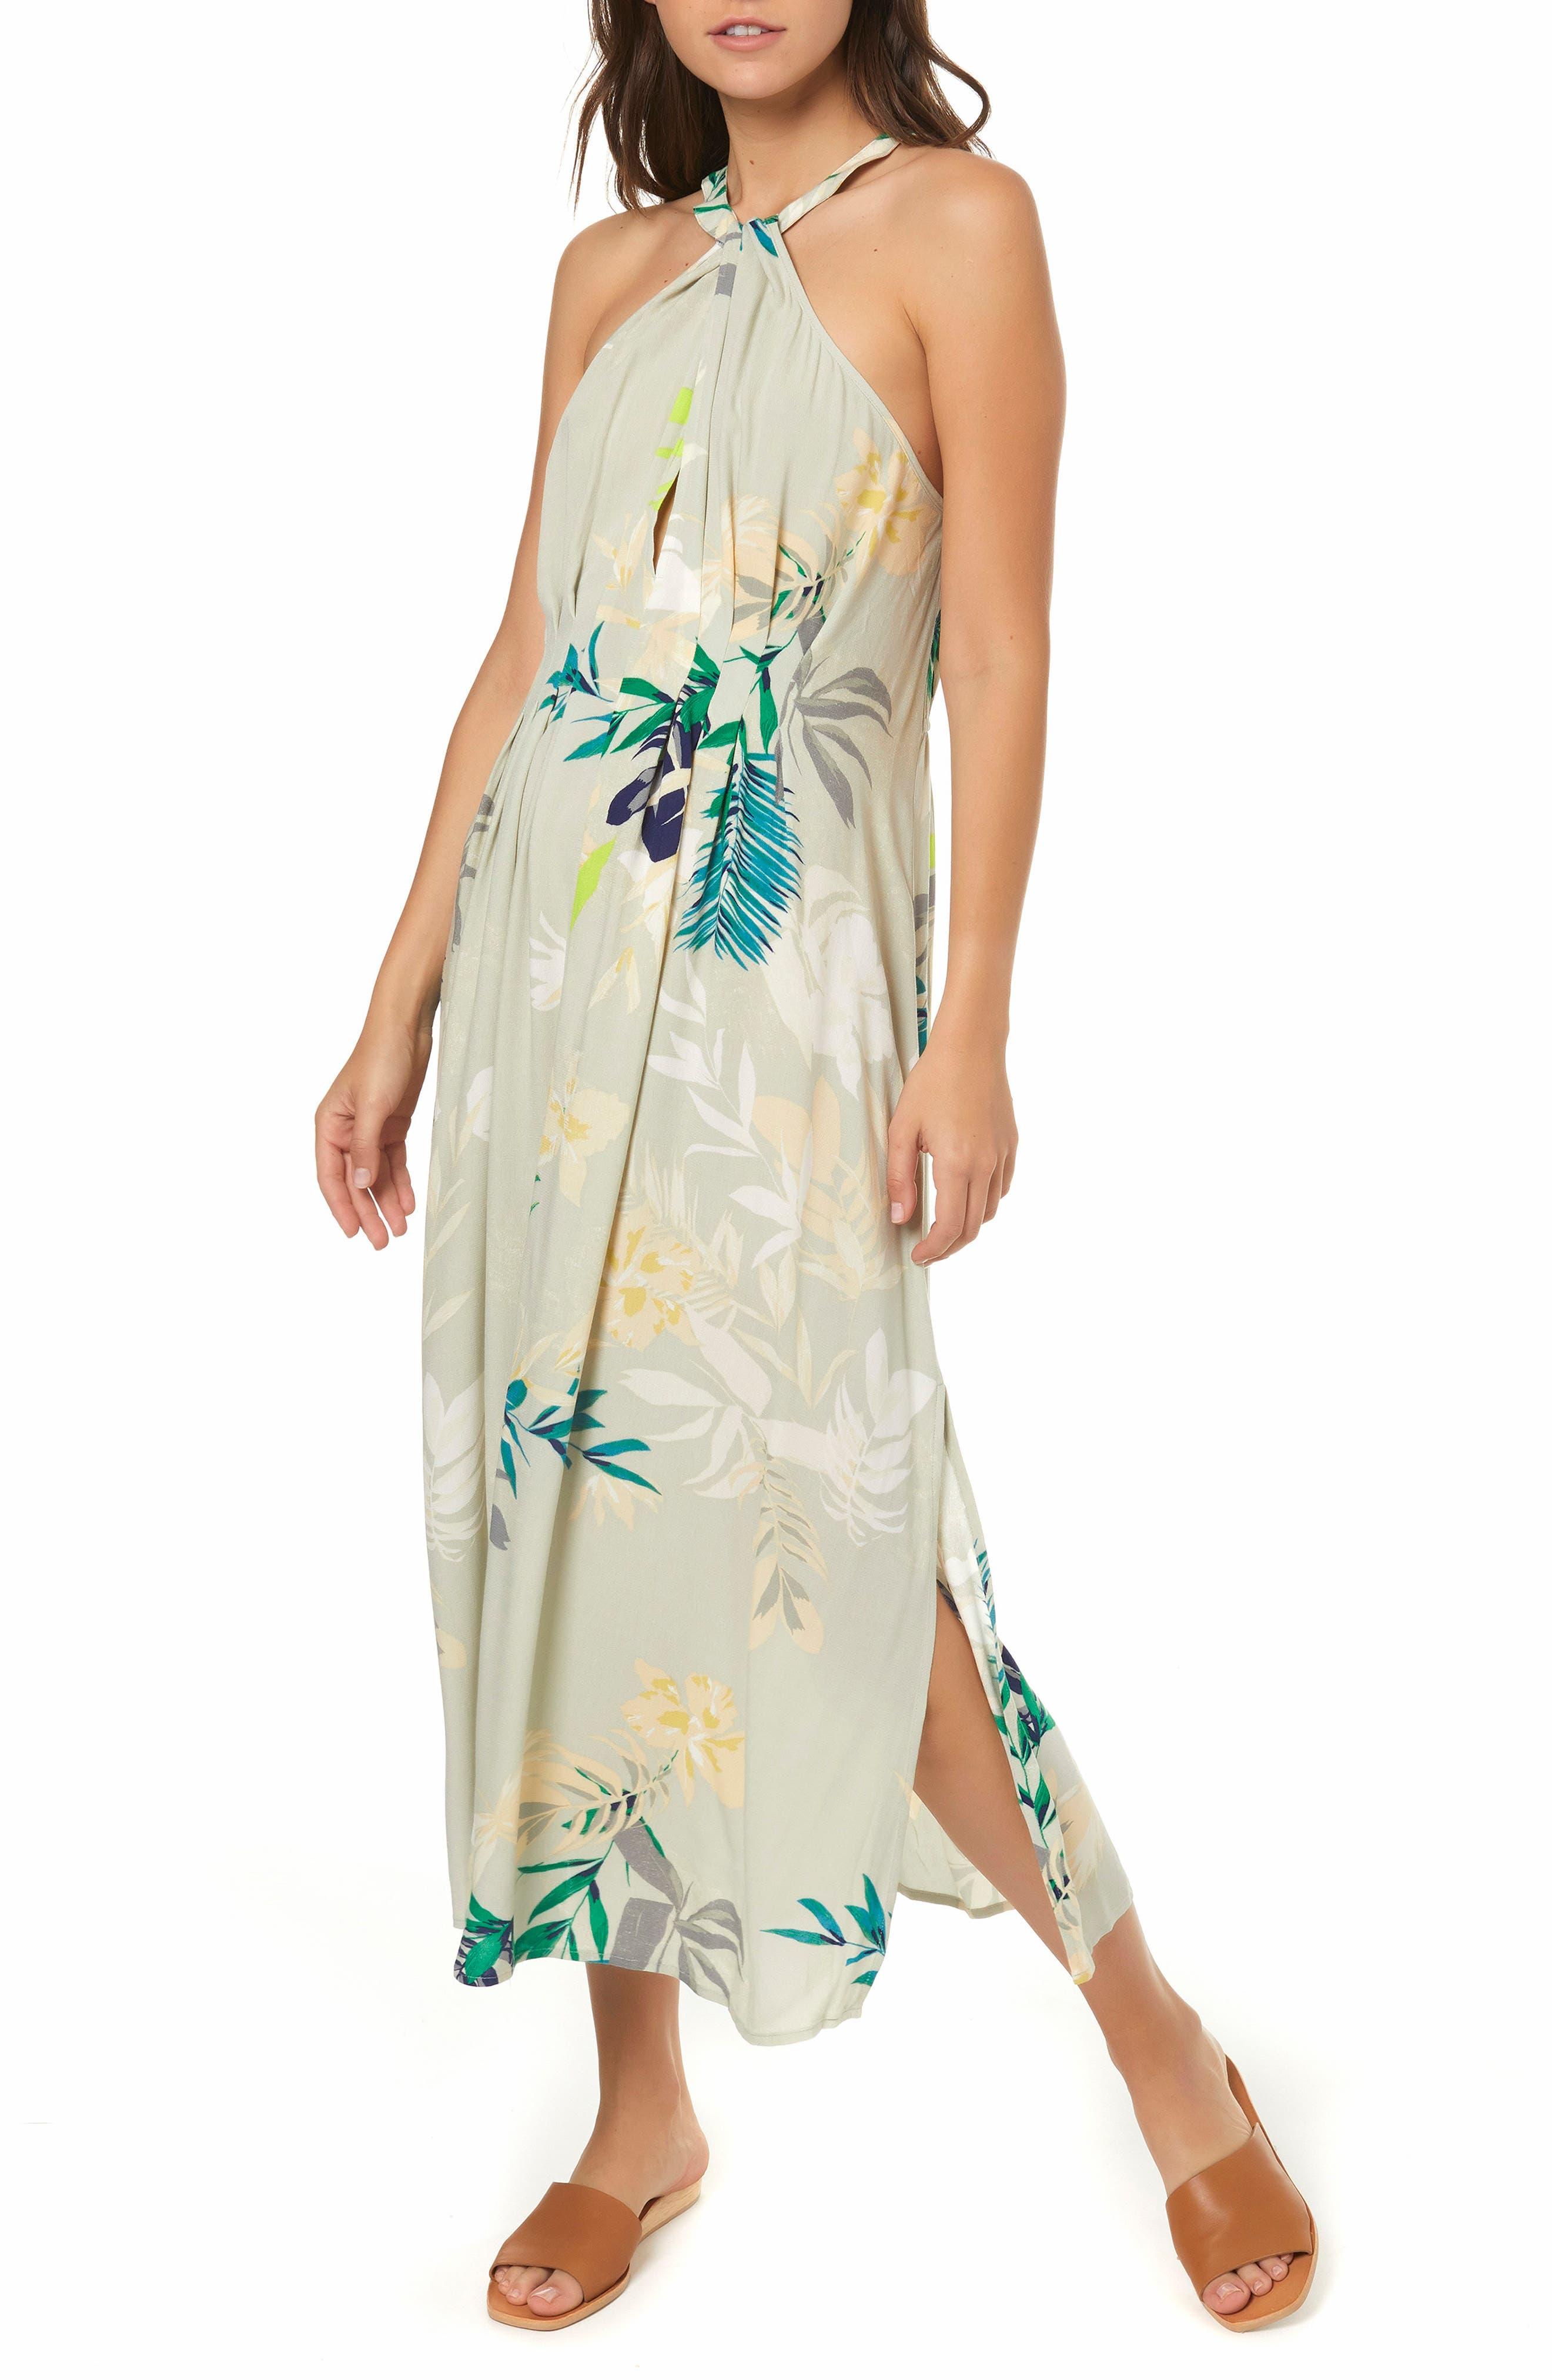 Byronne Floral Print Woven Midi Dress,                         Main,                         color, MULTI COLORED